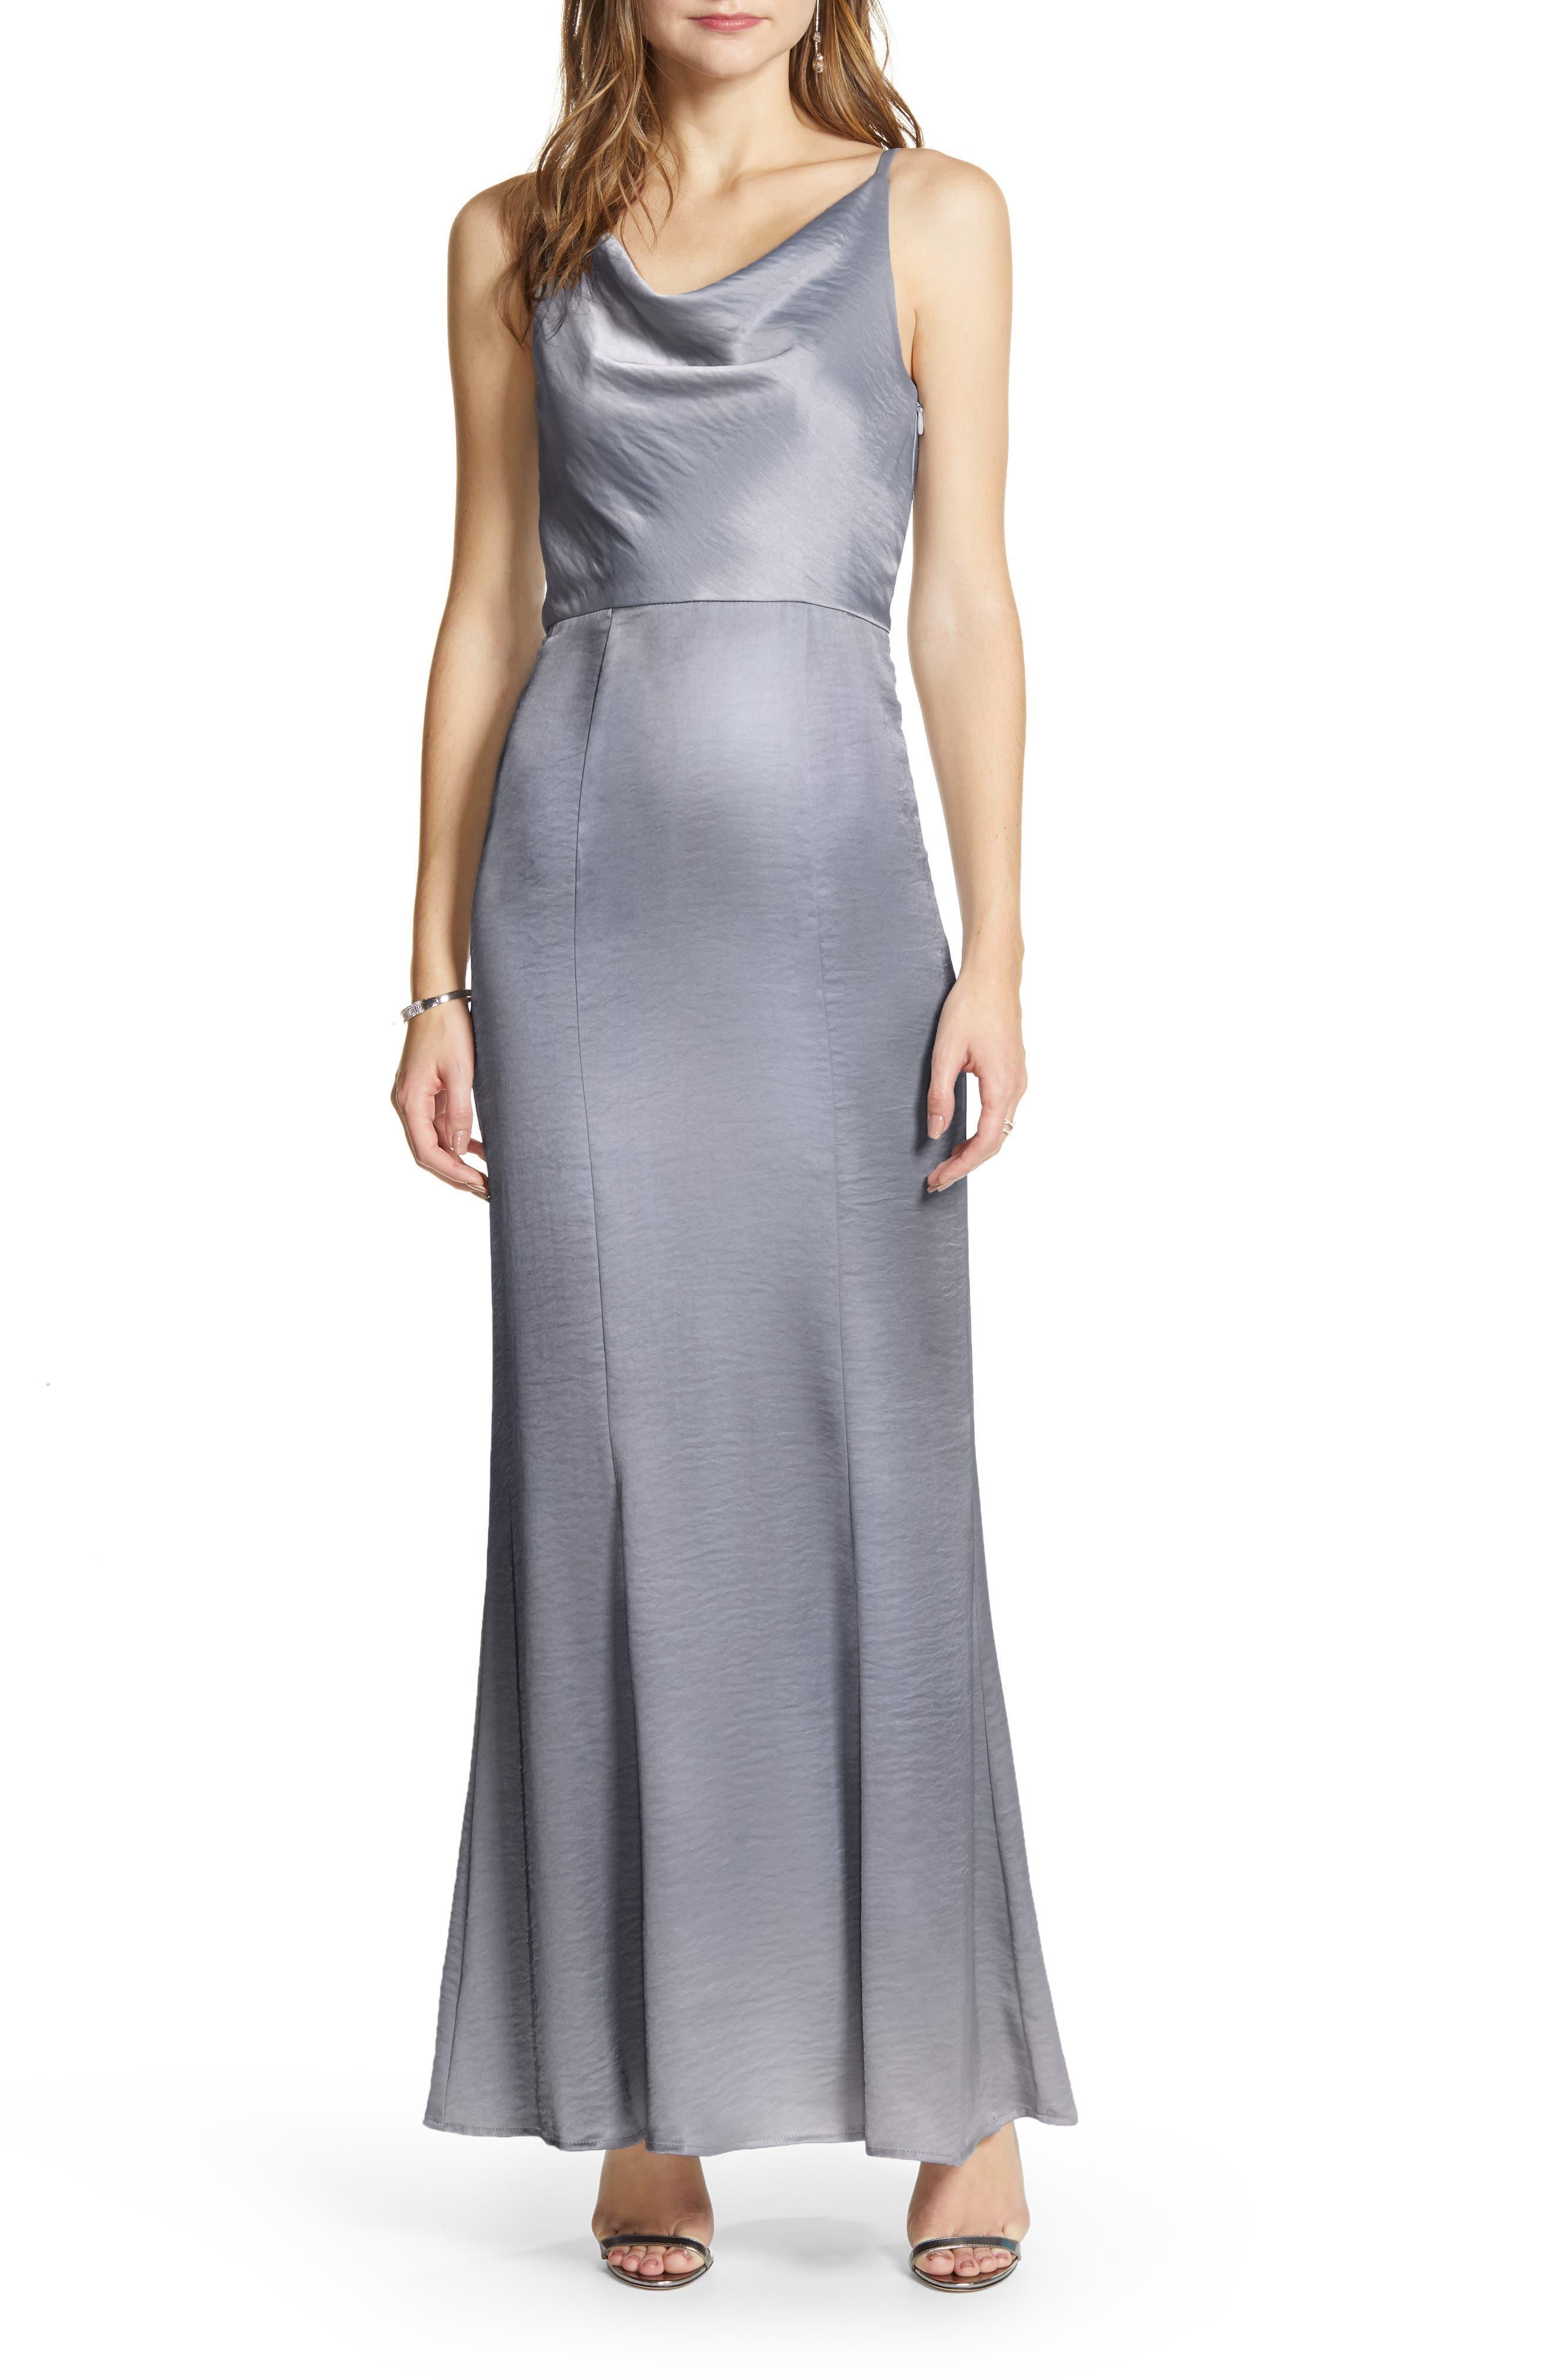 Vintage Evening Dresses and Formal Evening Gowns Womens Chi Chi London Delaney Cowl Neck Satin Trumpet Gown $130.00 AT vintagedancer.com